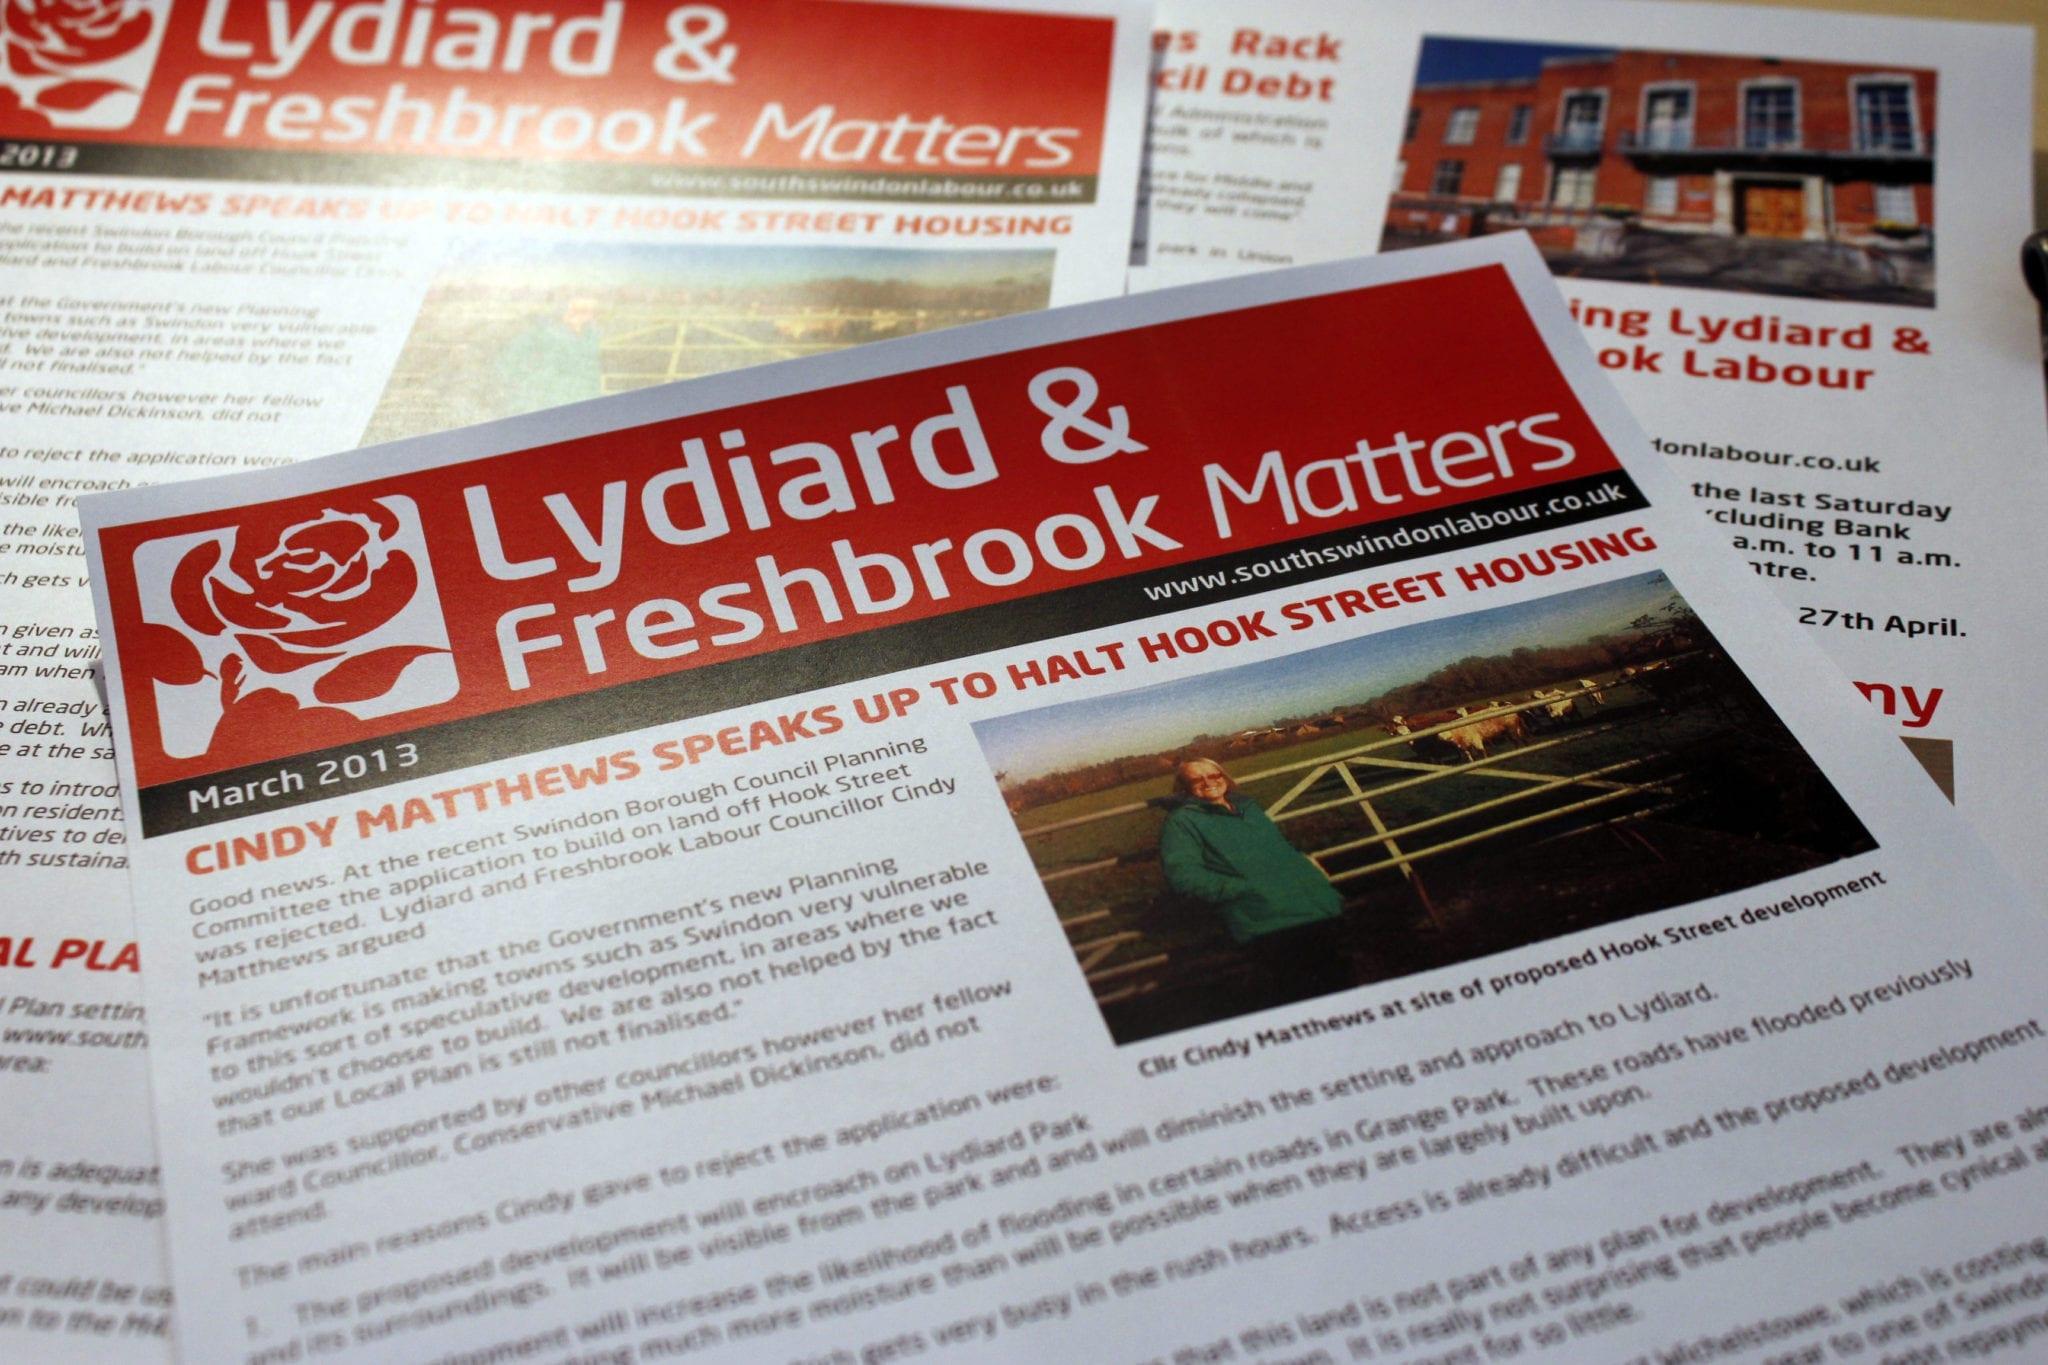 newsletter-leaflet-for-south-swindon-labour-party.jpg